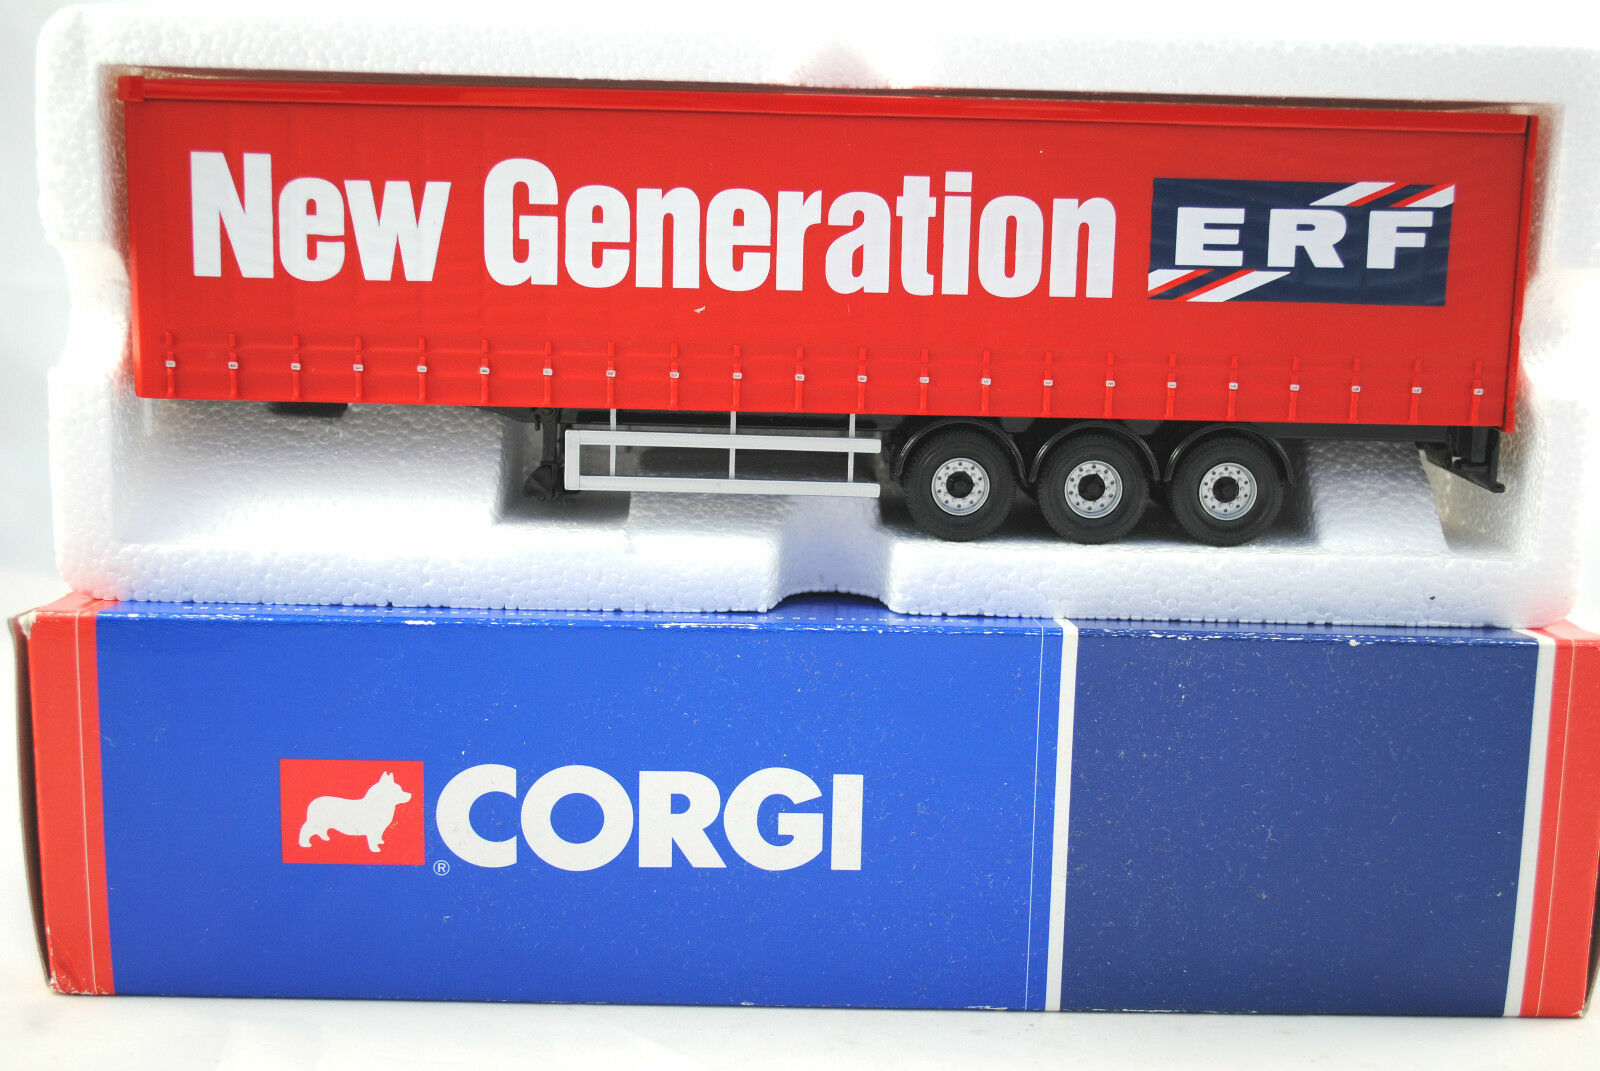 Corgi 1 50 Detailed 3-Axle CURTAIN Trailer in NEW GENERATION ERF Logo 260mm Long